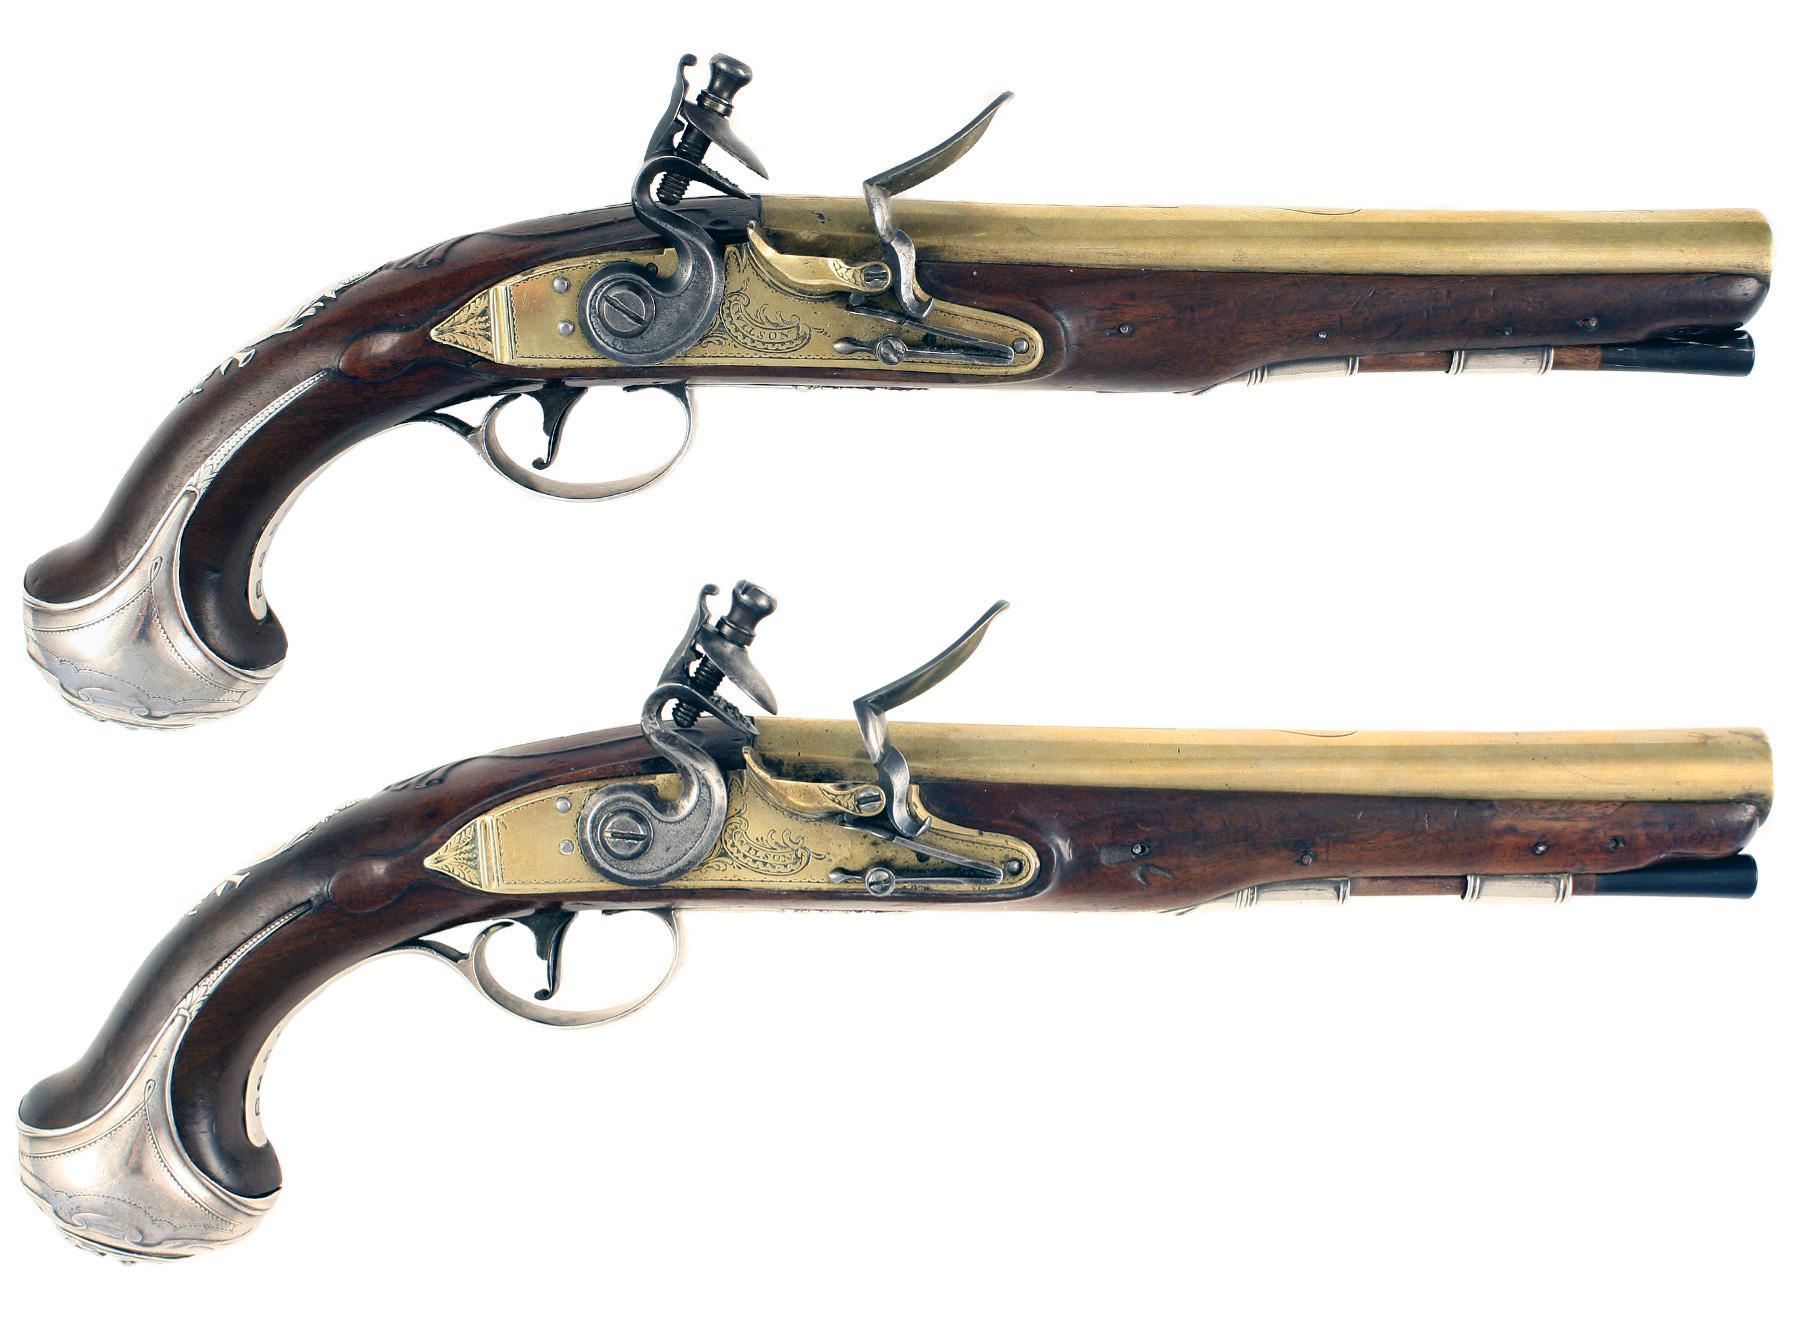 A Pair of Silver Mounted Flintlock Pistols